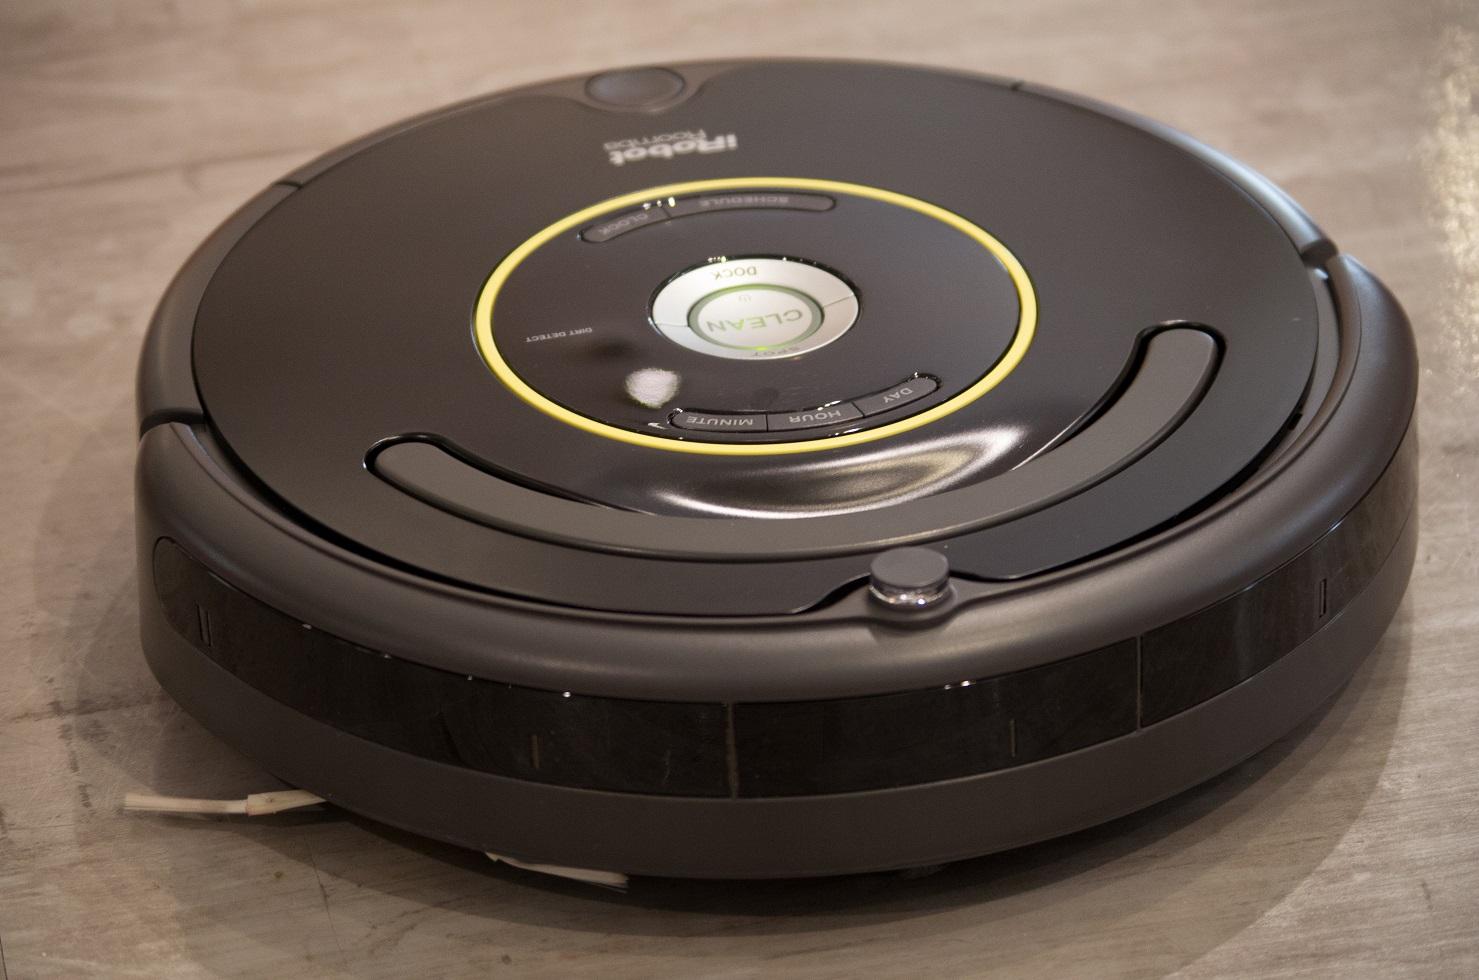 irobot roomba 650 alte besen kehren gut roboterwelt. Black Bedroom Furniture Sets. Home Design Ideas